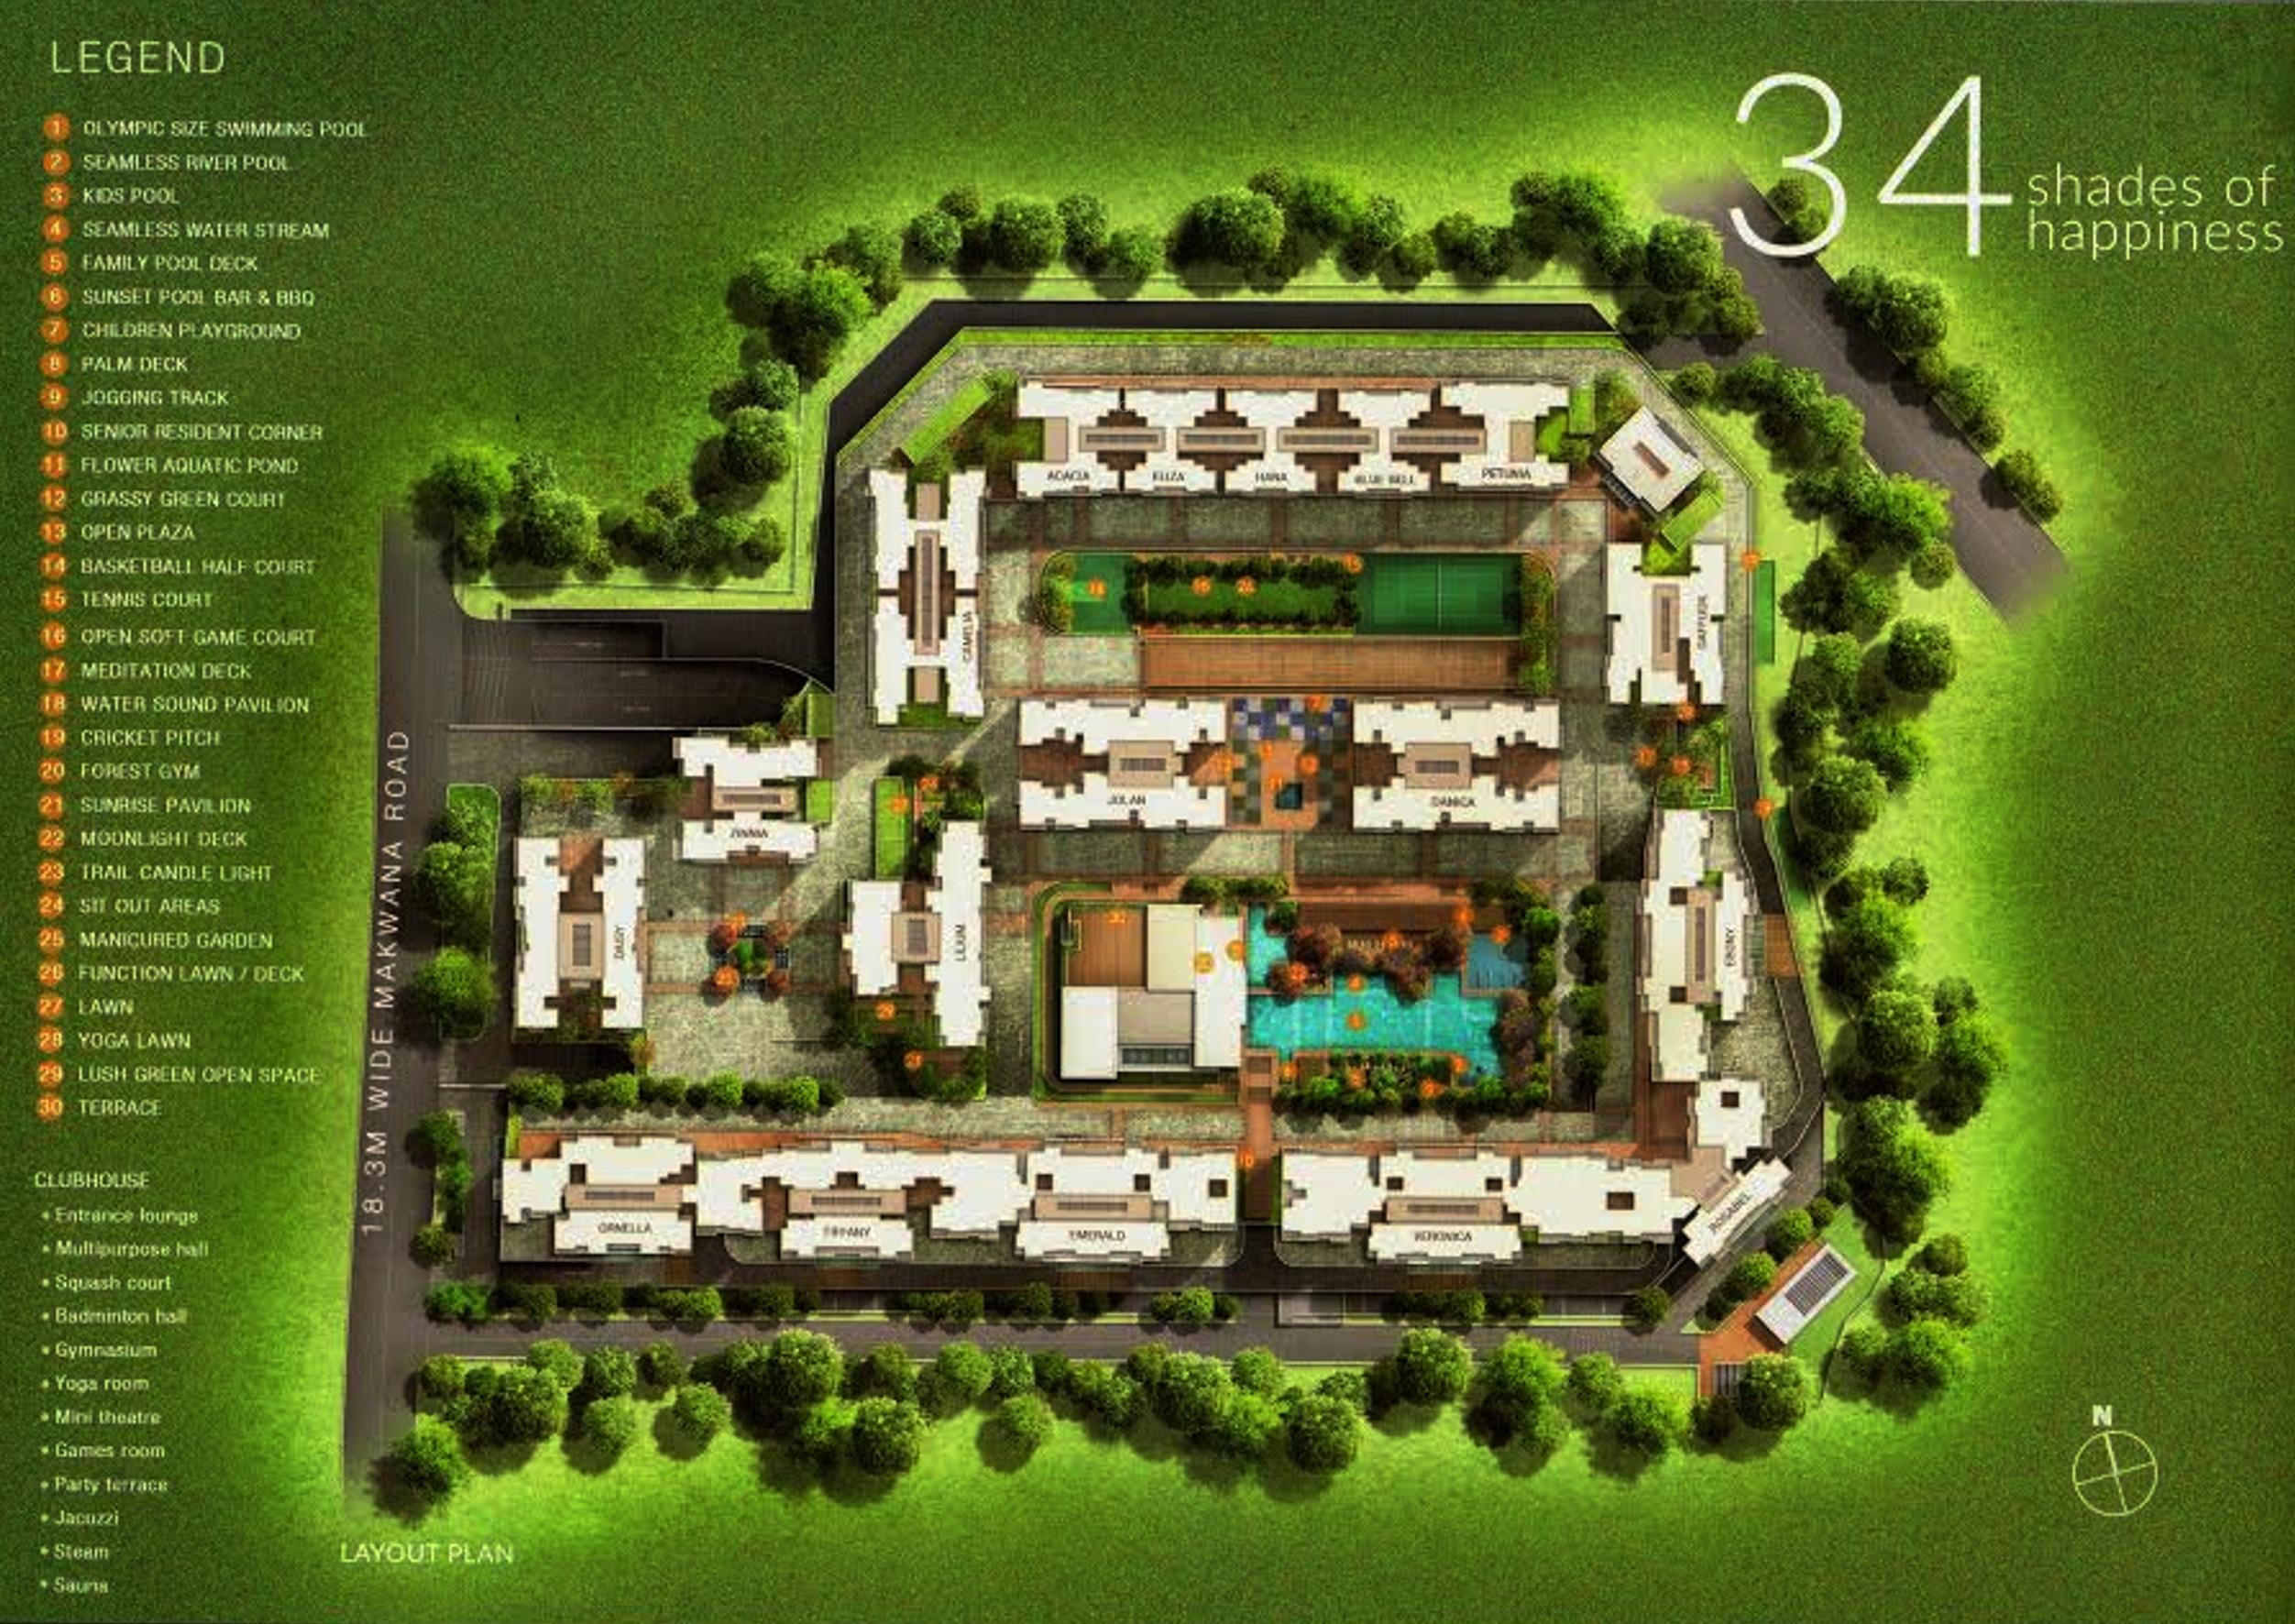 master-plan-image-Picture-sheth-vasant-oasis-2848040